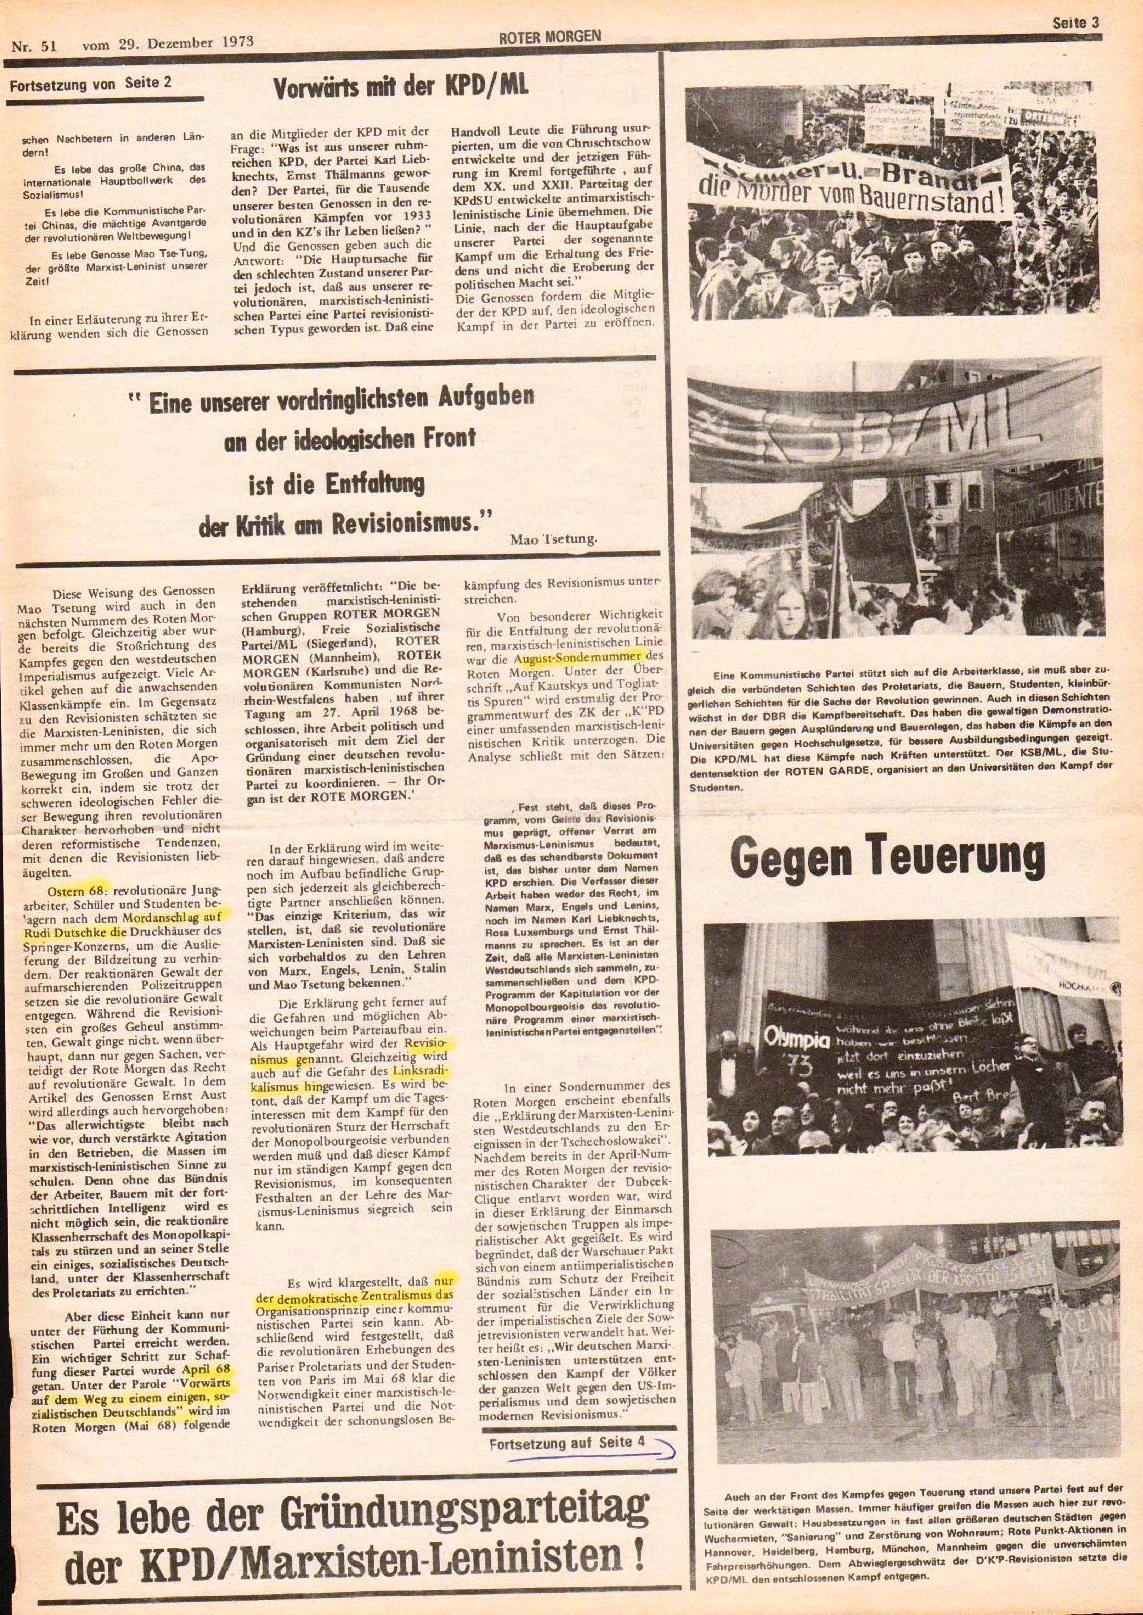 Roter Morgen, 7. Jg., 29. Dezember 1973, Nr. 51, Seite 3